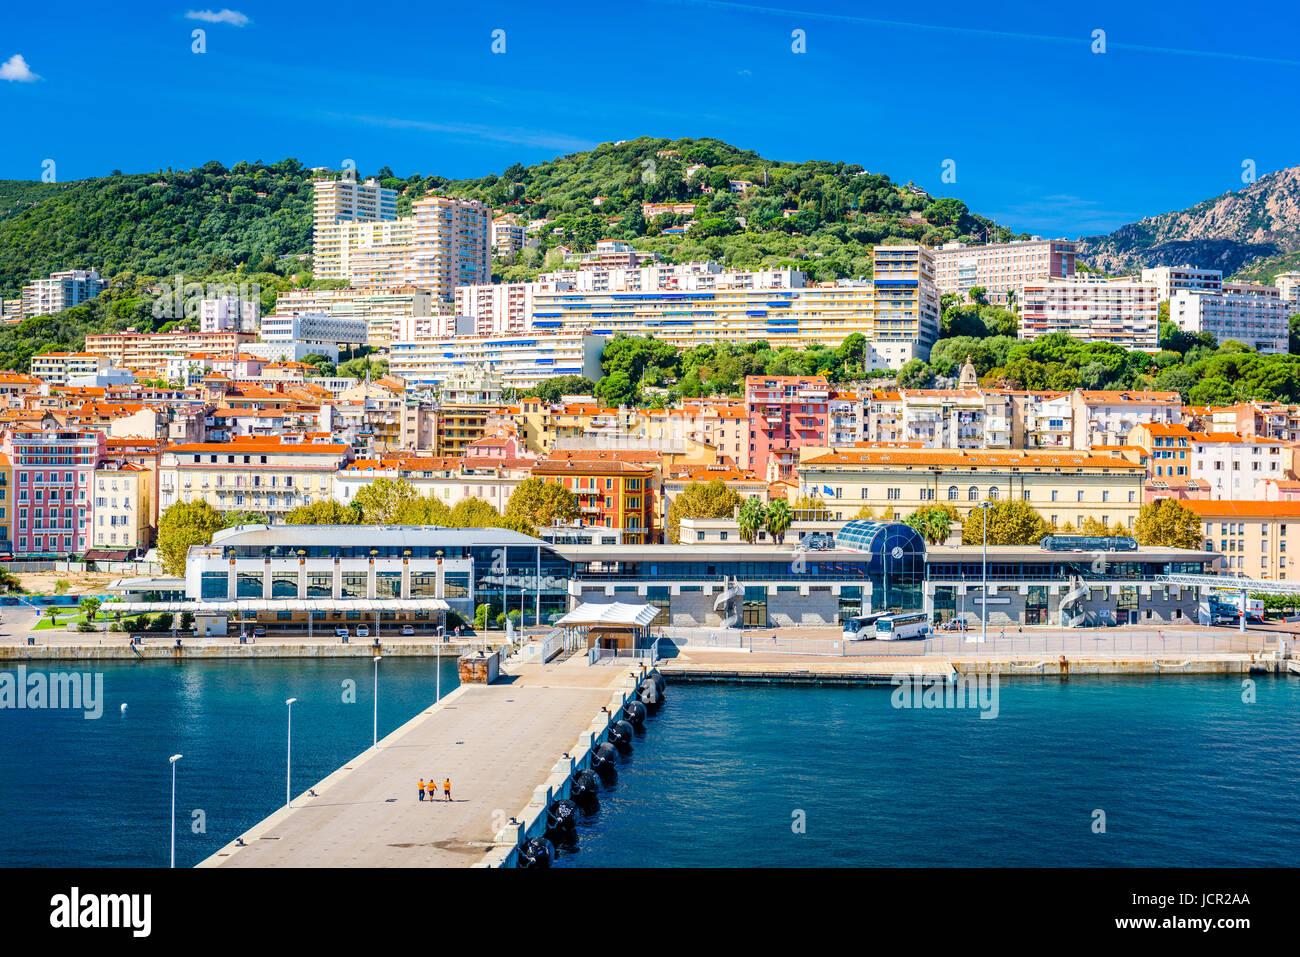 Ajaccio, Corsica, France coastal skyline. - Stock Image